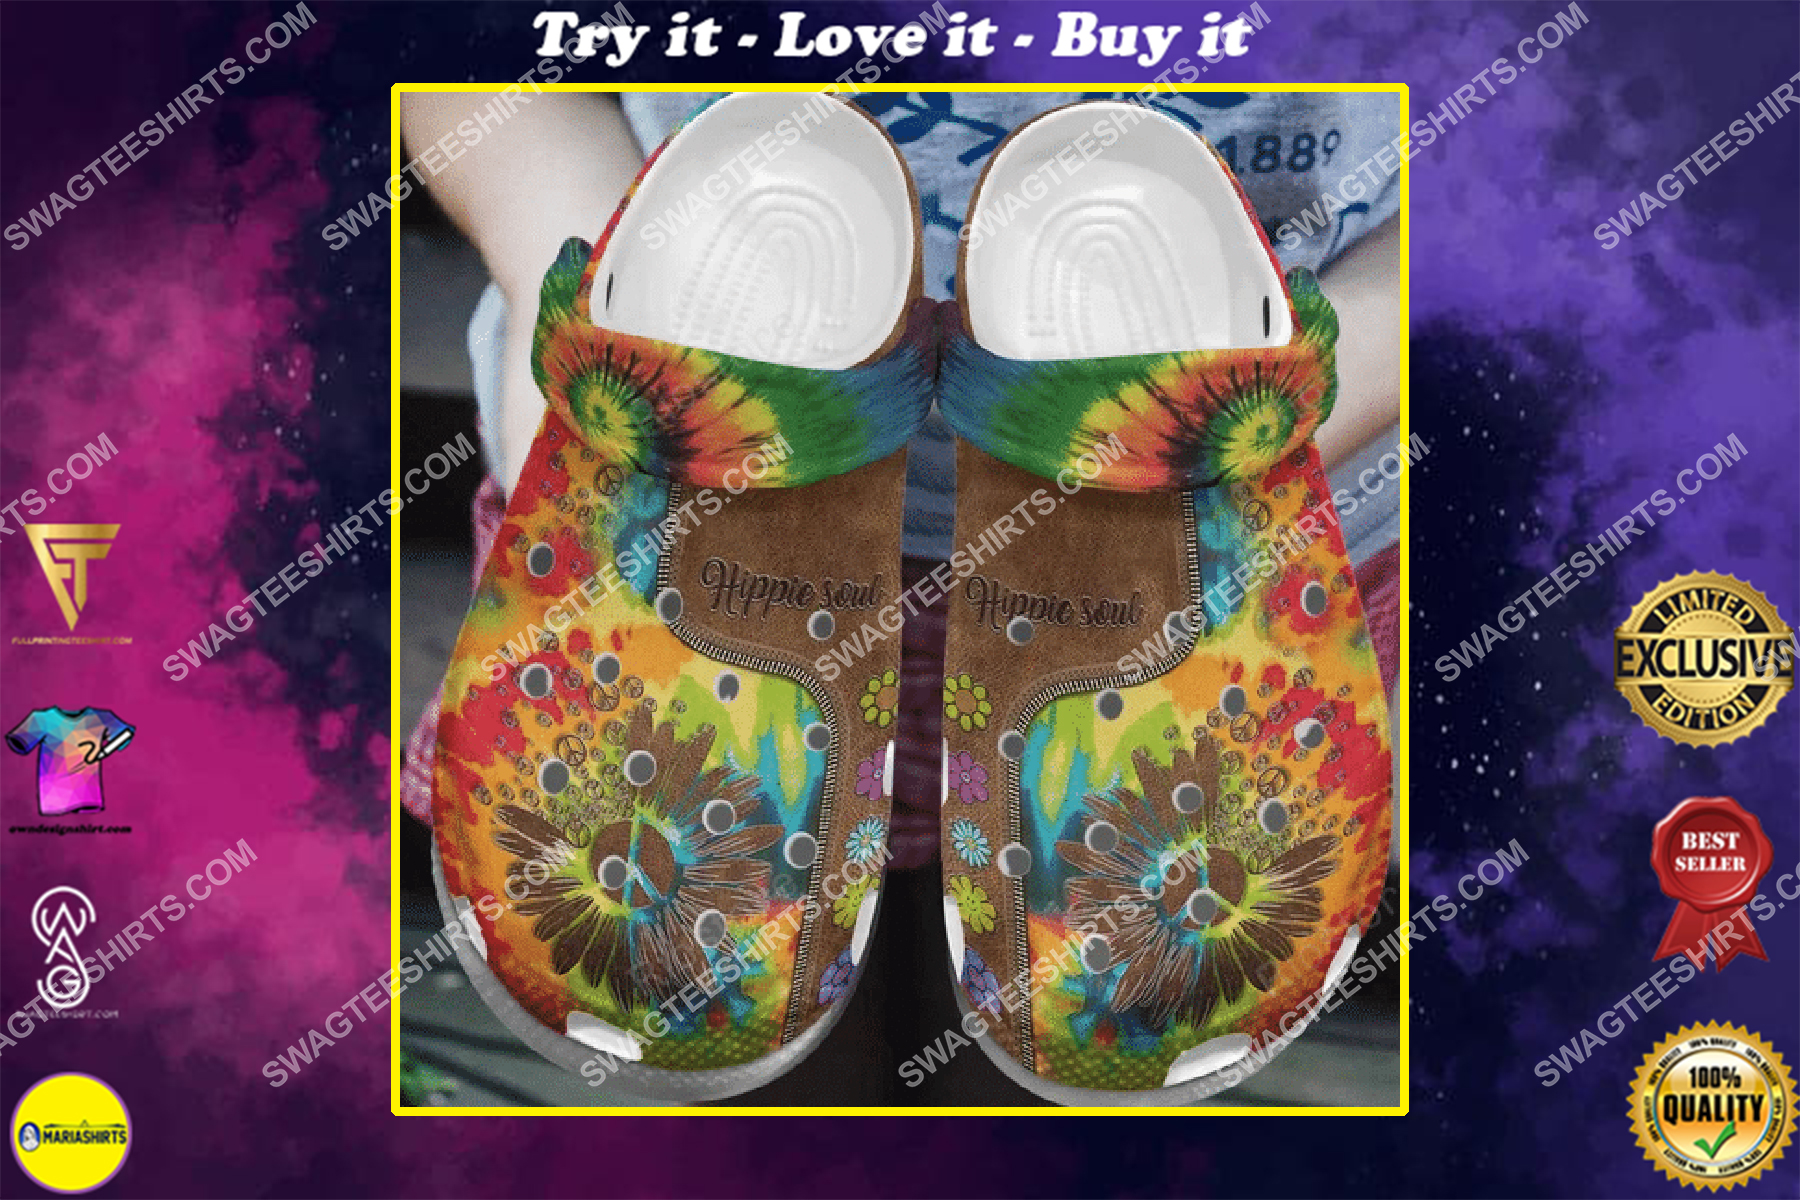 hippie soul all over printed crocs crocband clog